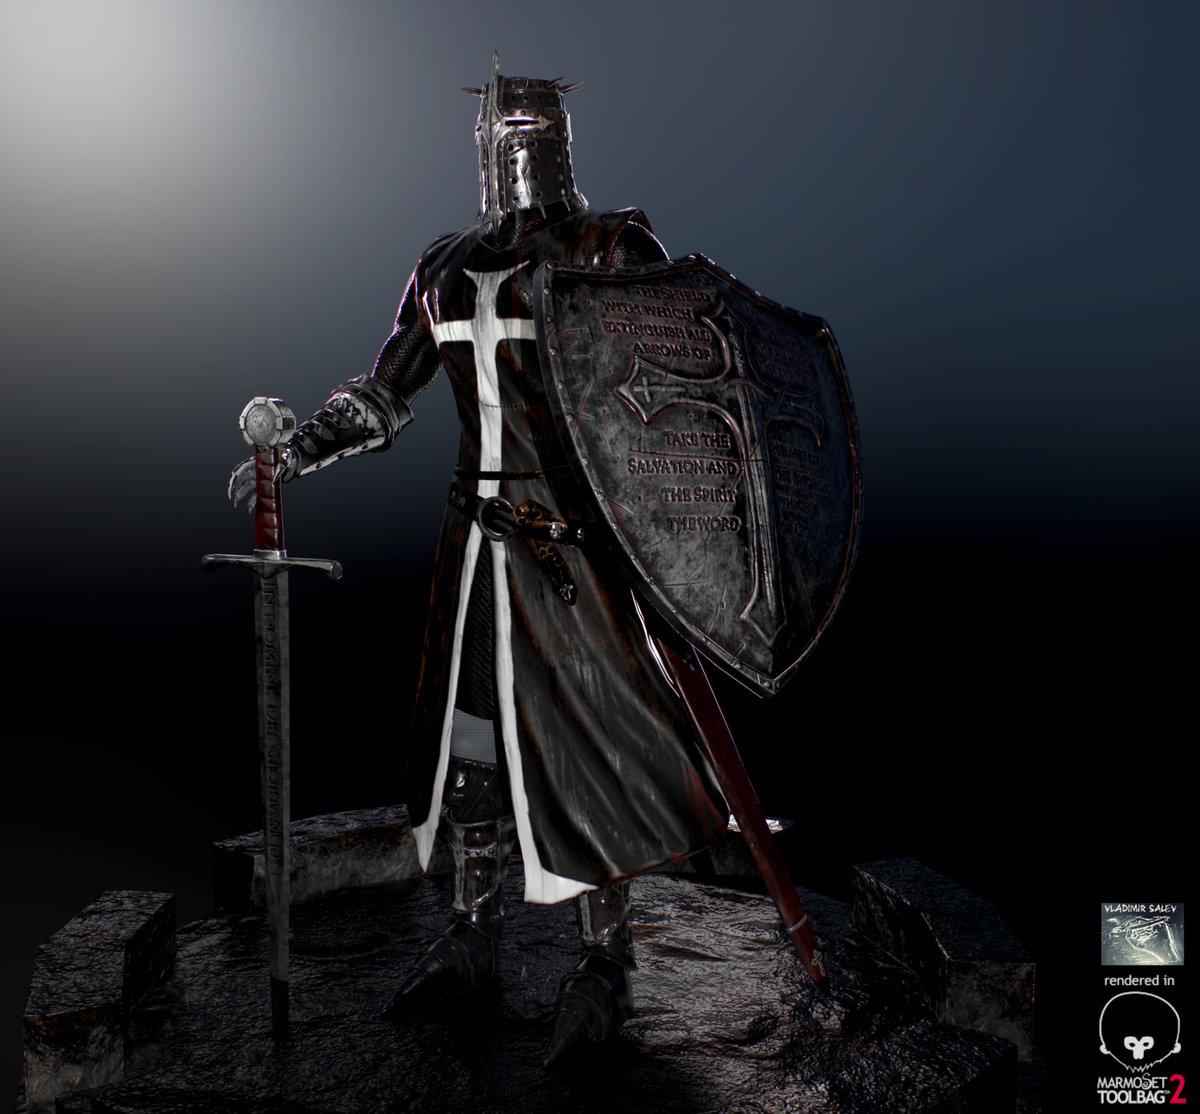 будут, фотографии рыцарей крестоносцев буква русского алфавита